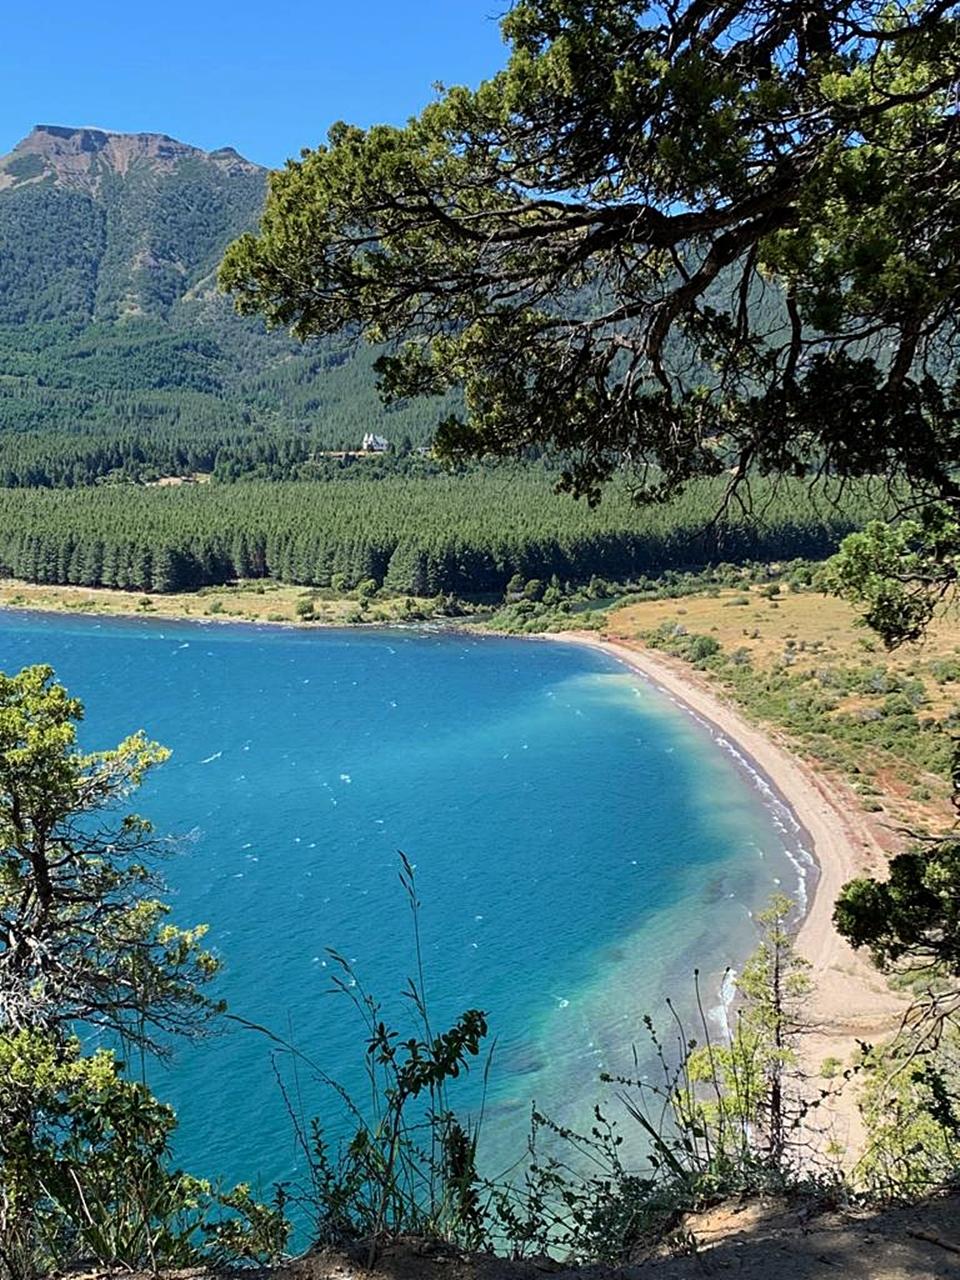 Lago Filo Hua Hum - Wikipedia, la enciclopedia libre